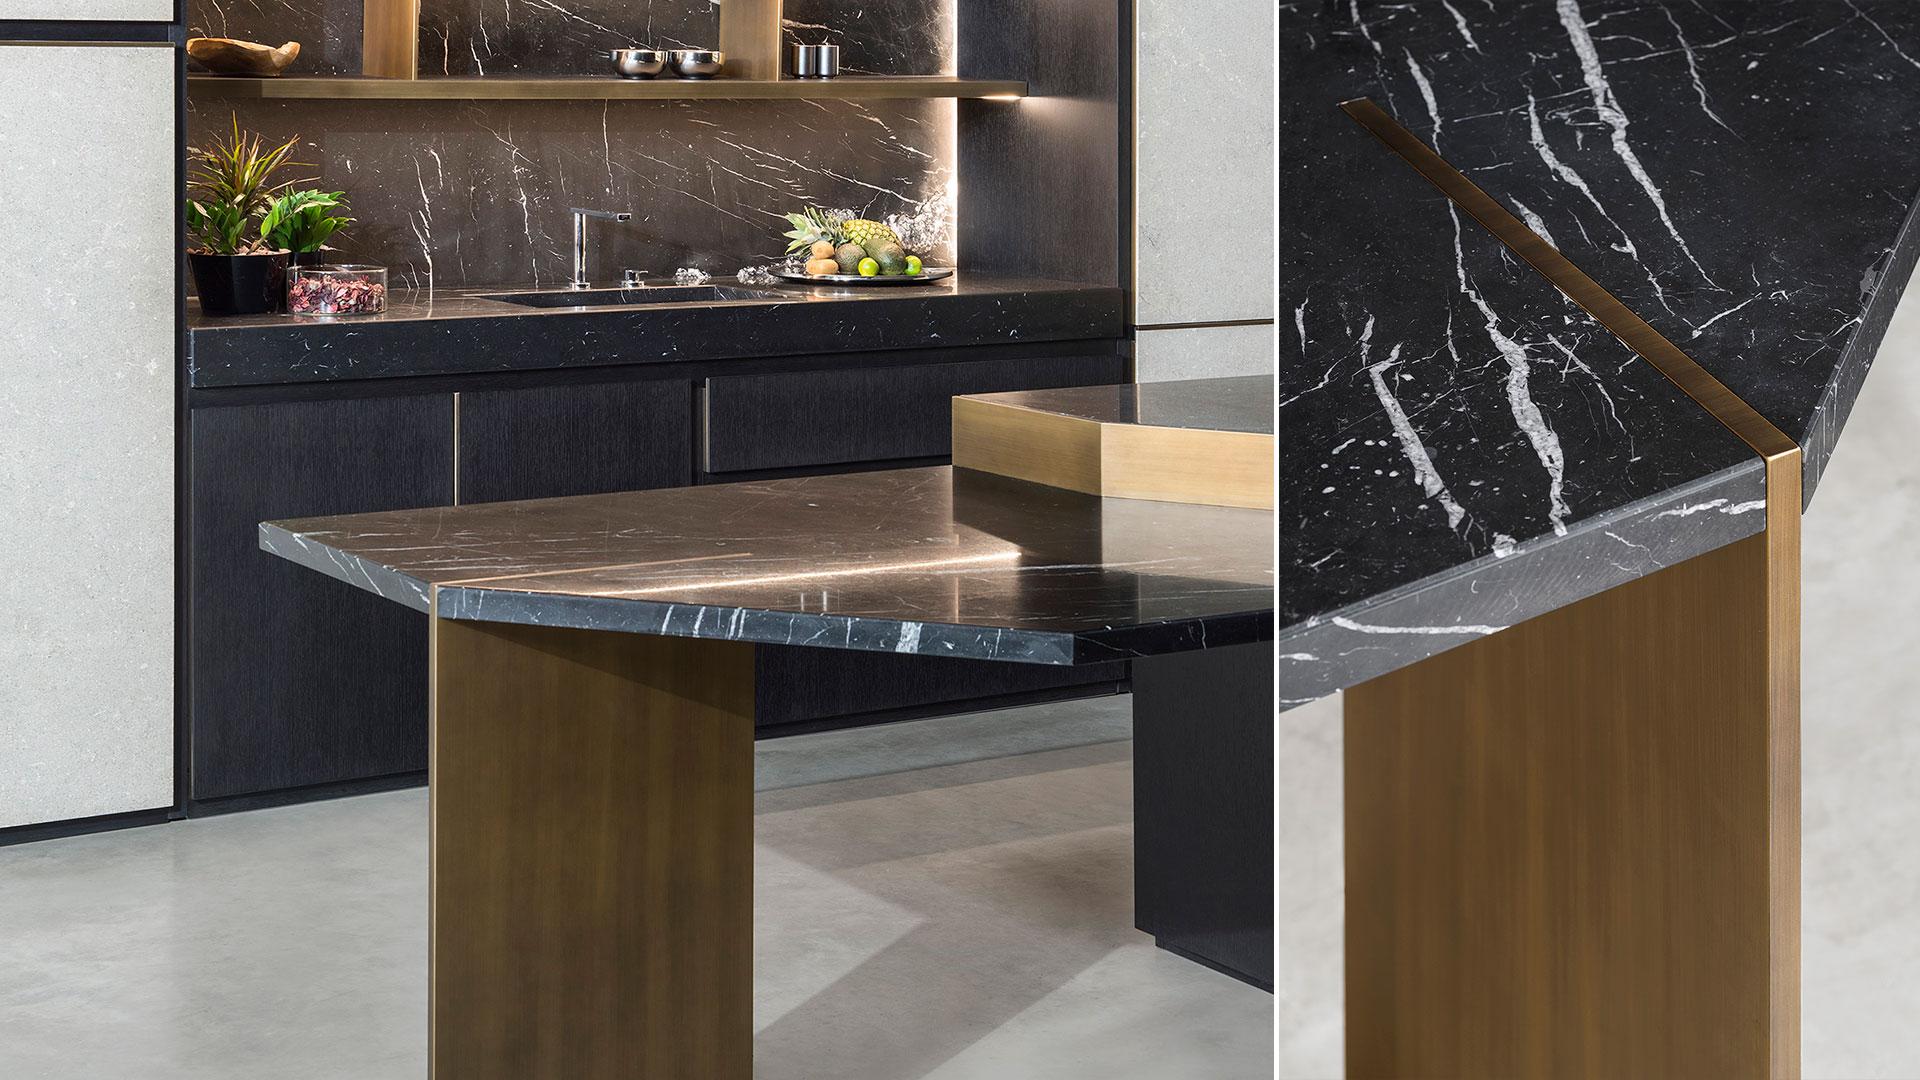 Design kitchen, smart kitchen, stone kitchen - Special Project Petra(18) - TM_MI2018_Petra18_new_006